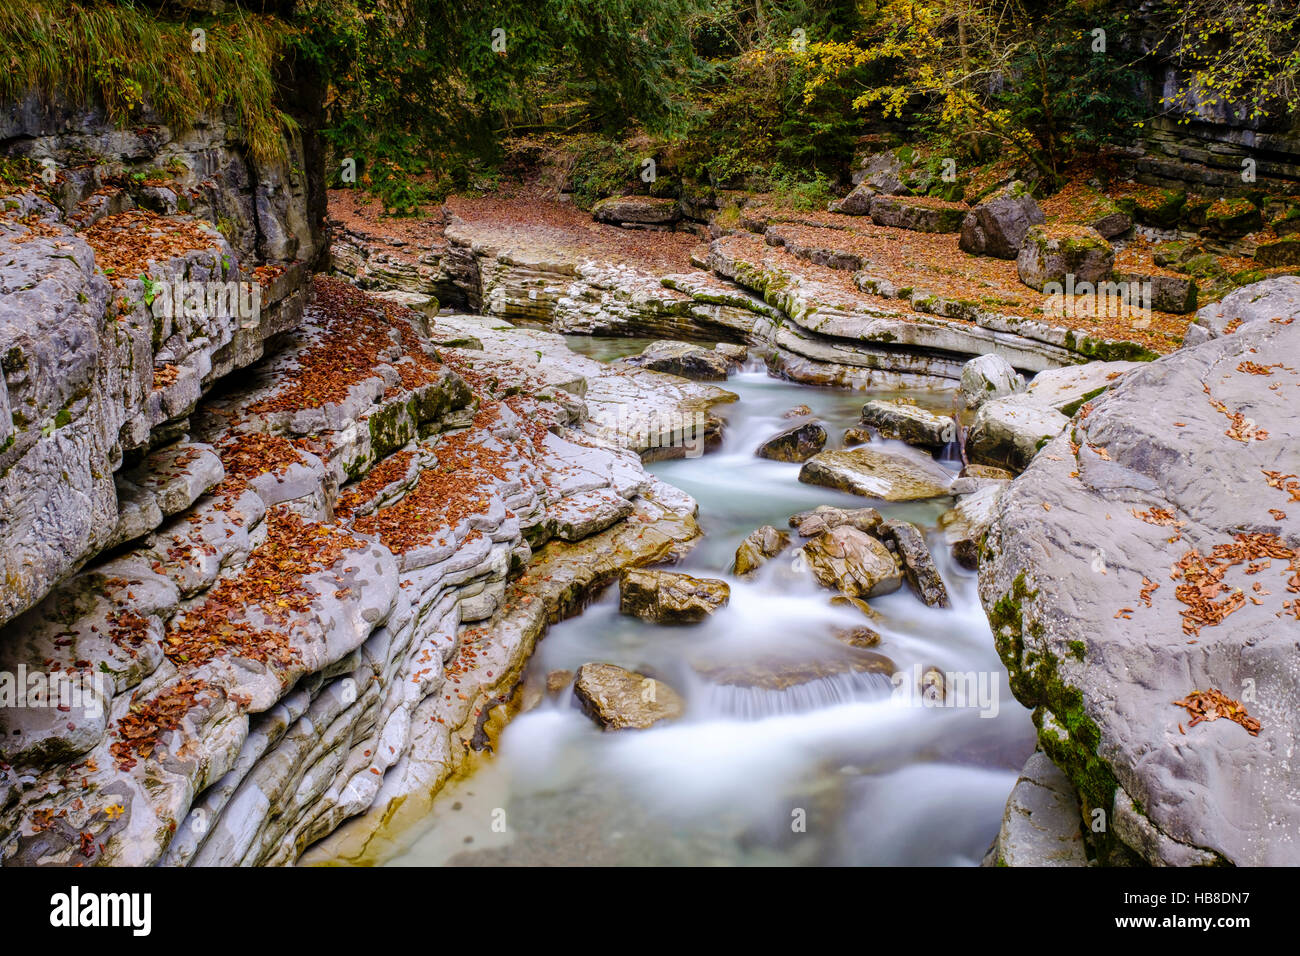 Stream, Taugl, Tauglbach, Tauglgries Nature Reserve, Bad Vigaun, Hallein District, Salzburg, Austria Stock Photo